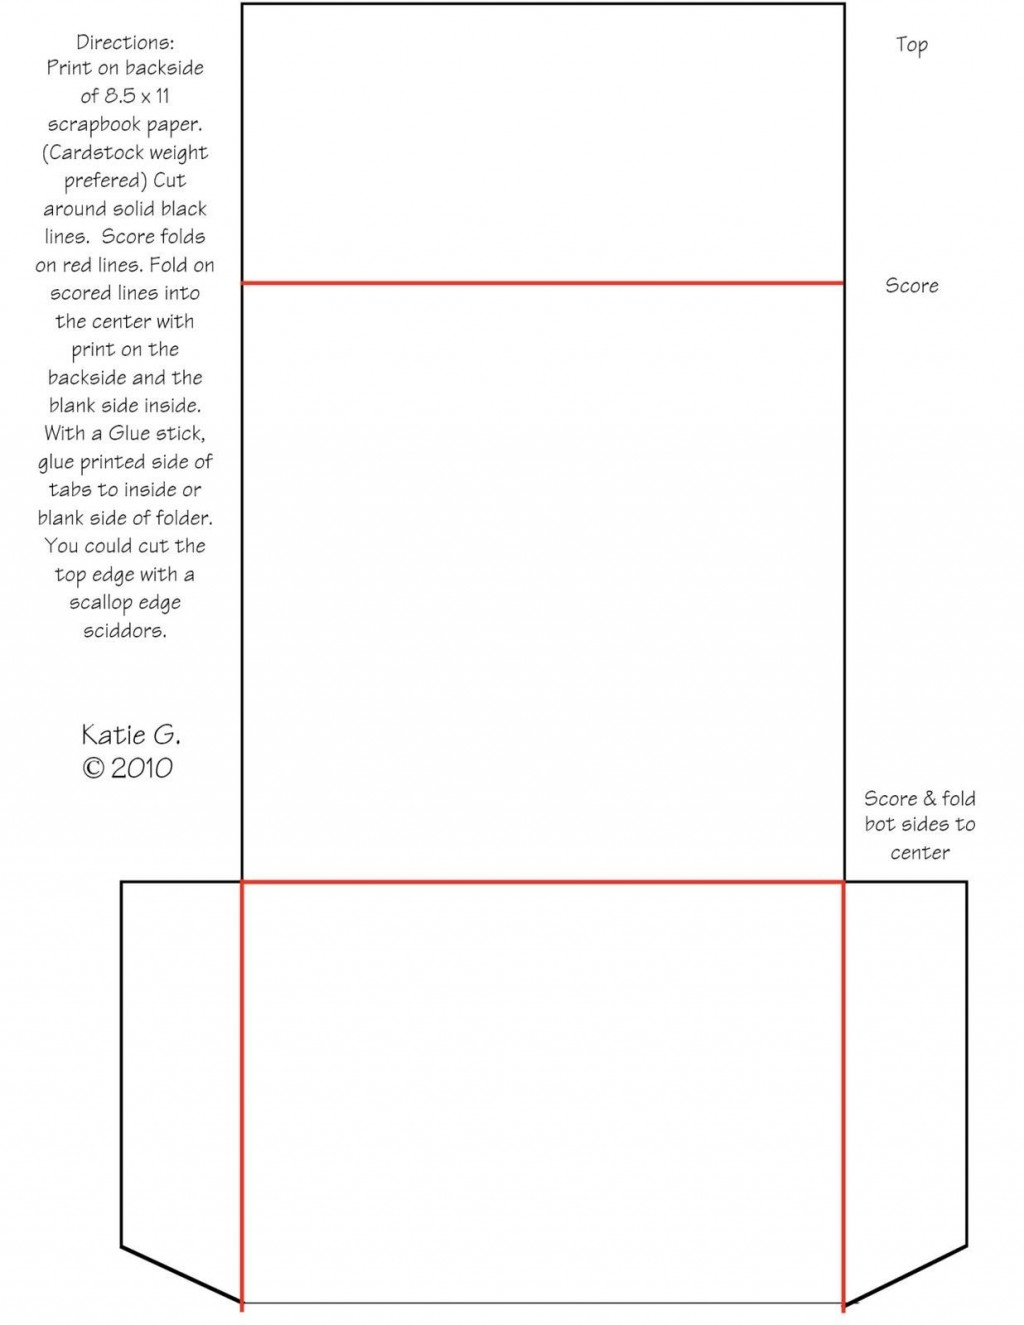 001 Unbelievable Printable Cd Sleeve Template Sample  Free Case Cover Blank JewelLarge